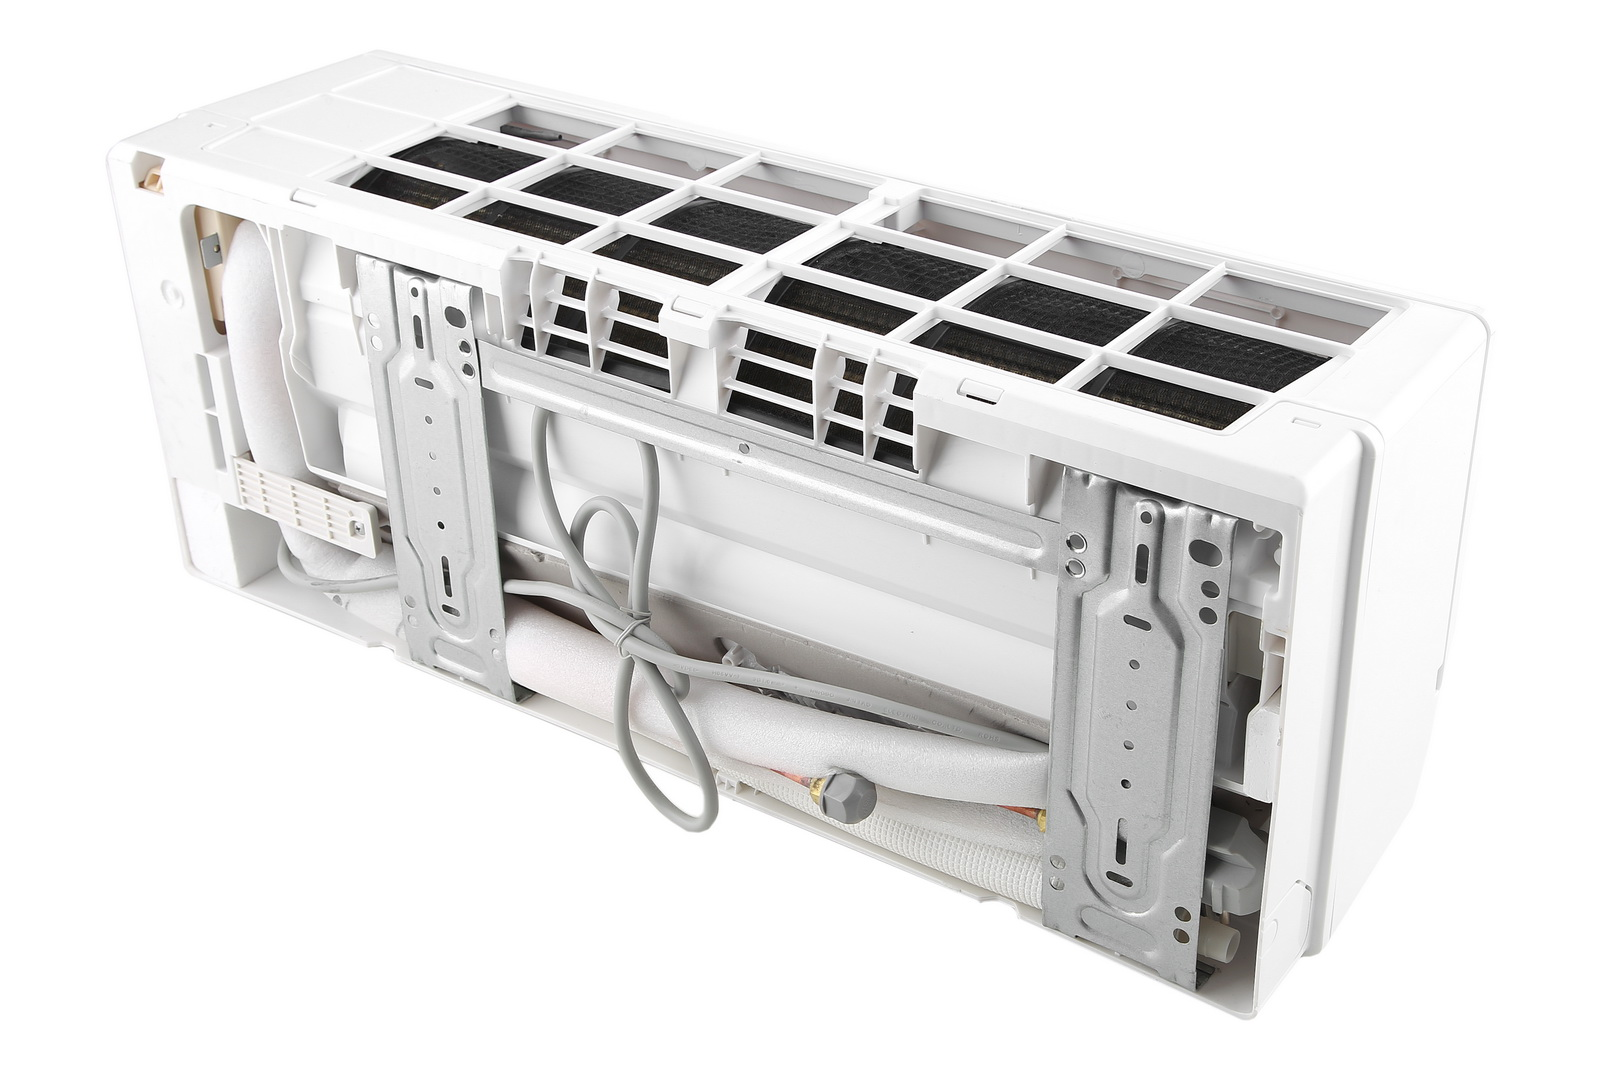 Сплит-система Roda Rs-s07b/ru-s07b внутренний блок от 220 Вольт